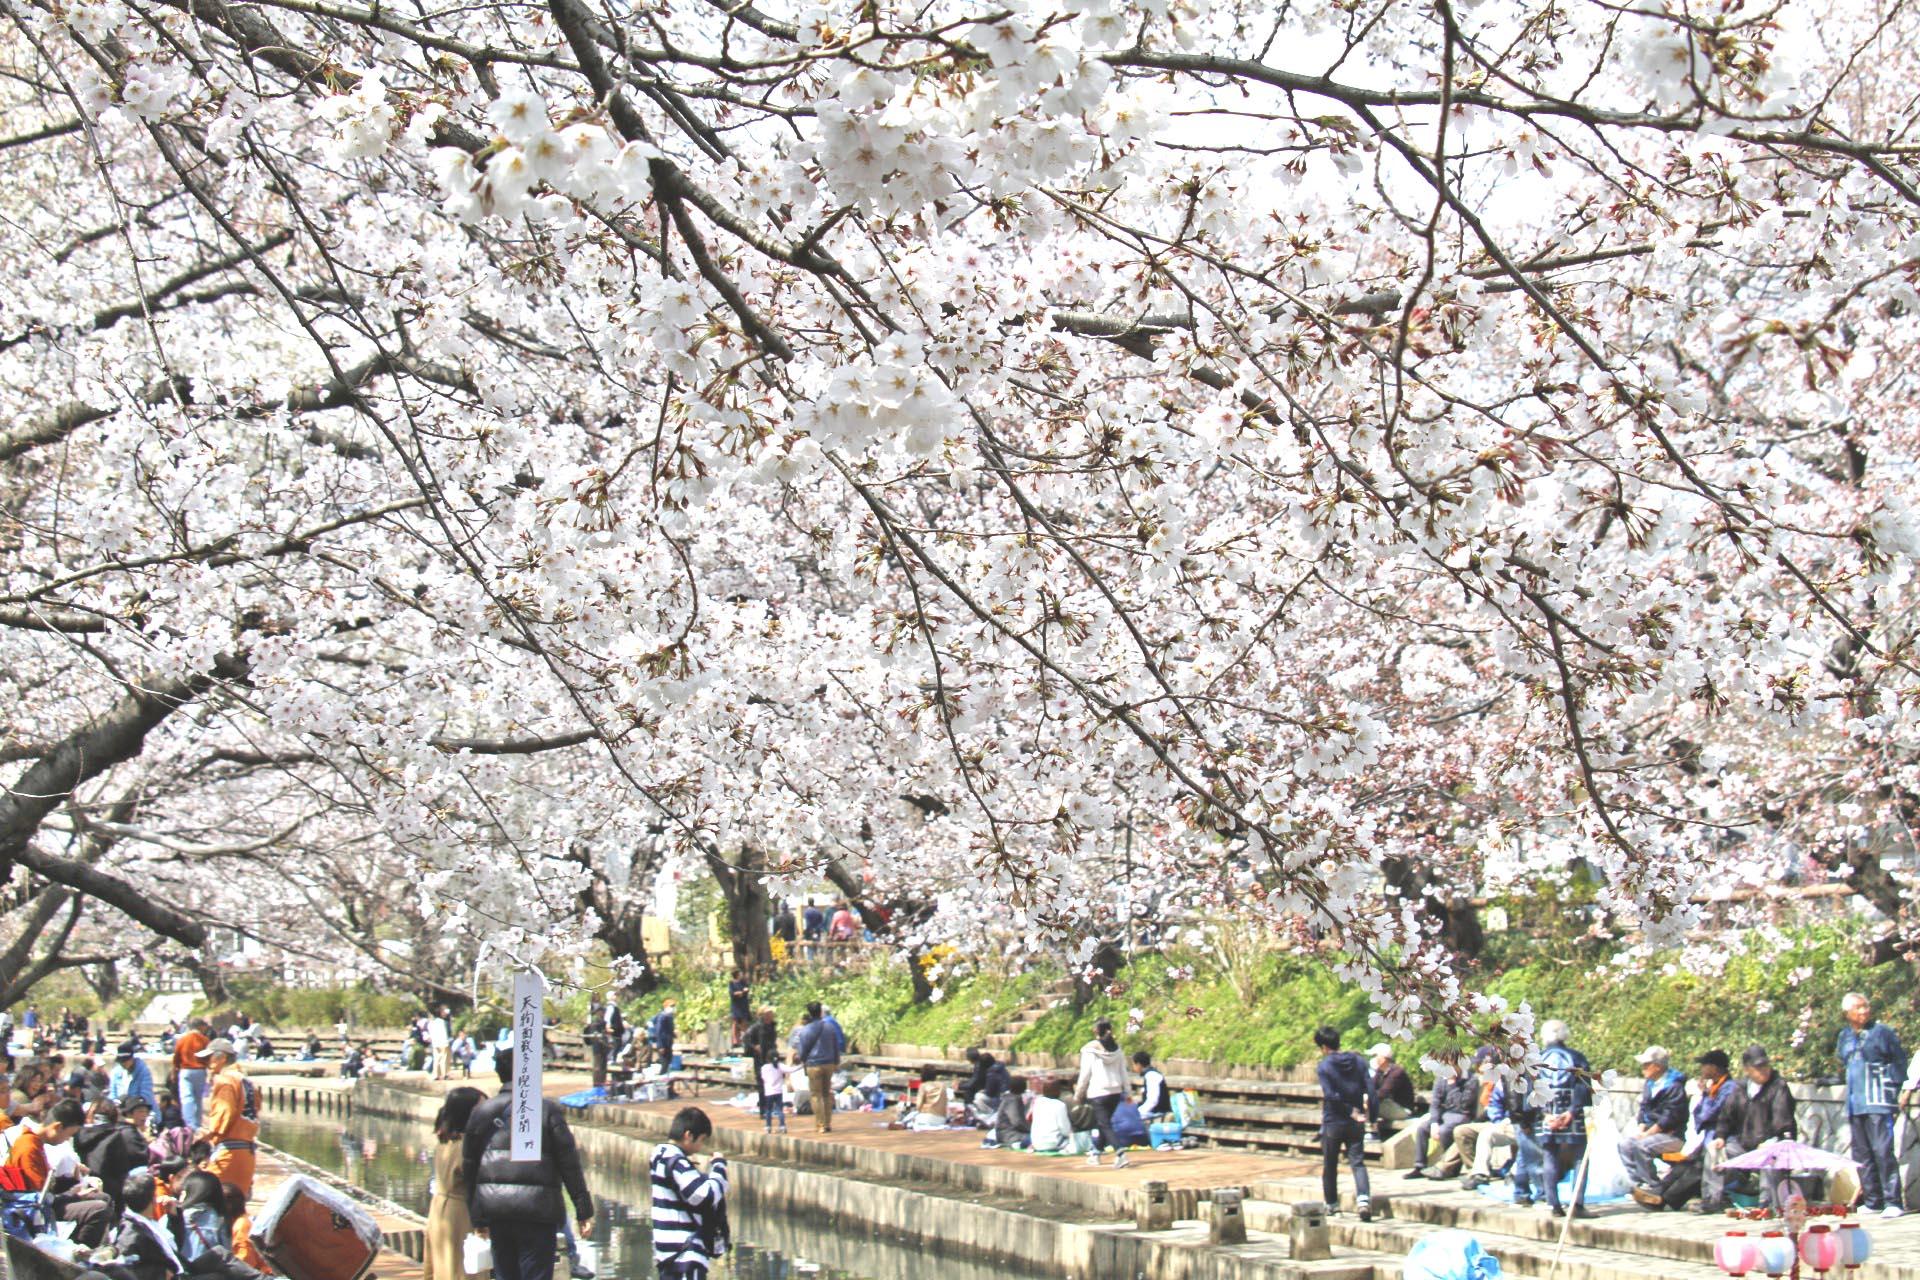 吹上 元荒川の桜 埼玉の風景